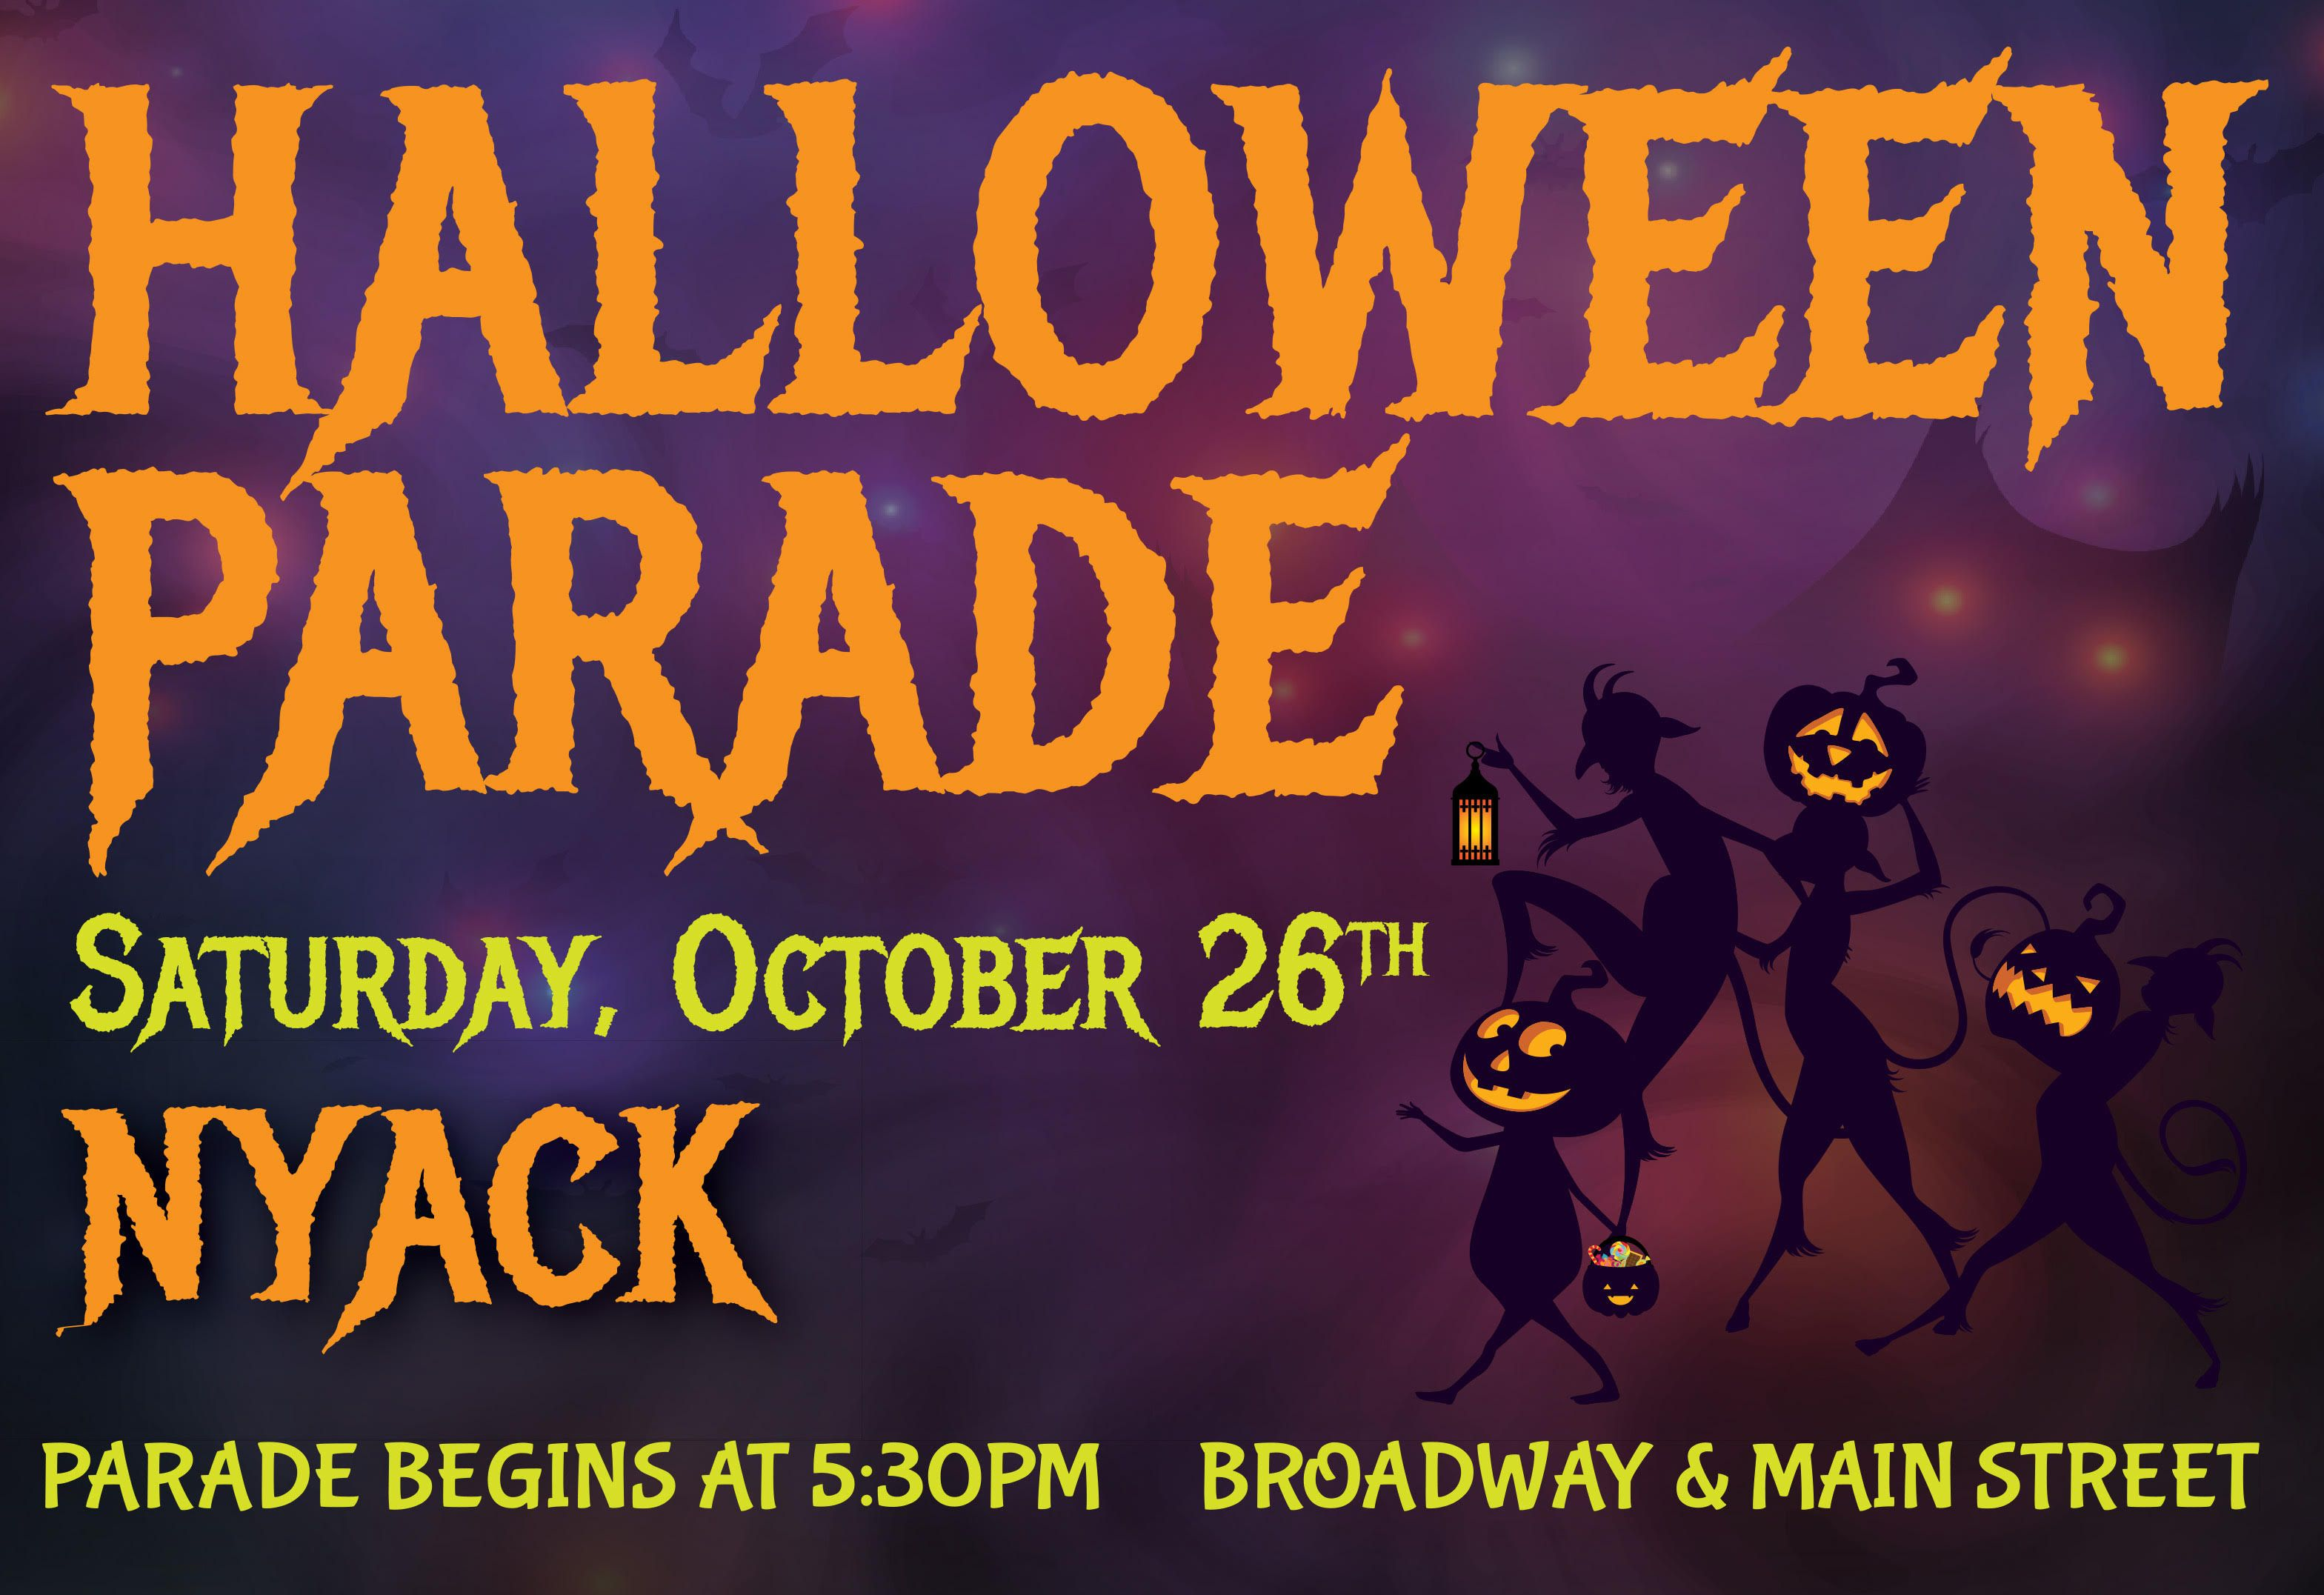 Nyack Halloween Parade 2020 Nyack Halloween Parade – Oct 24, 2020   Halloween parade